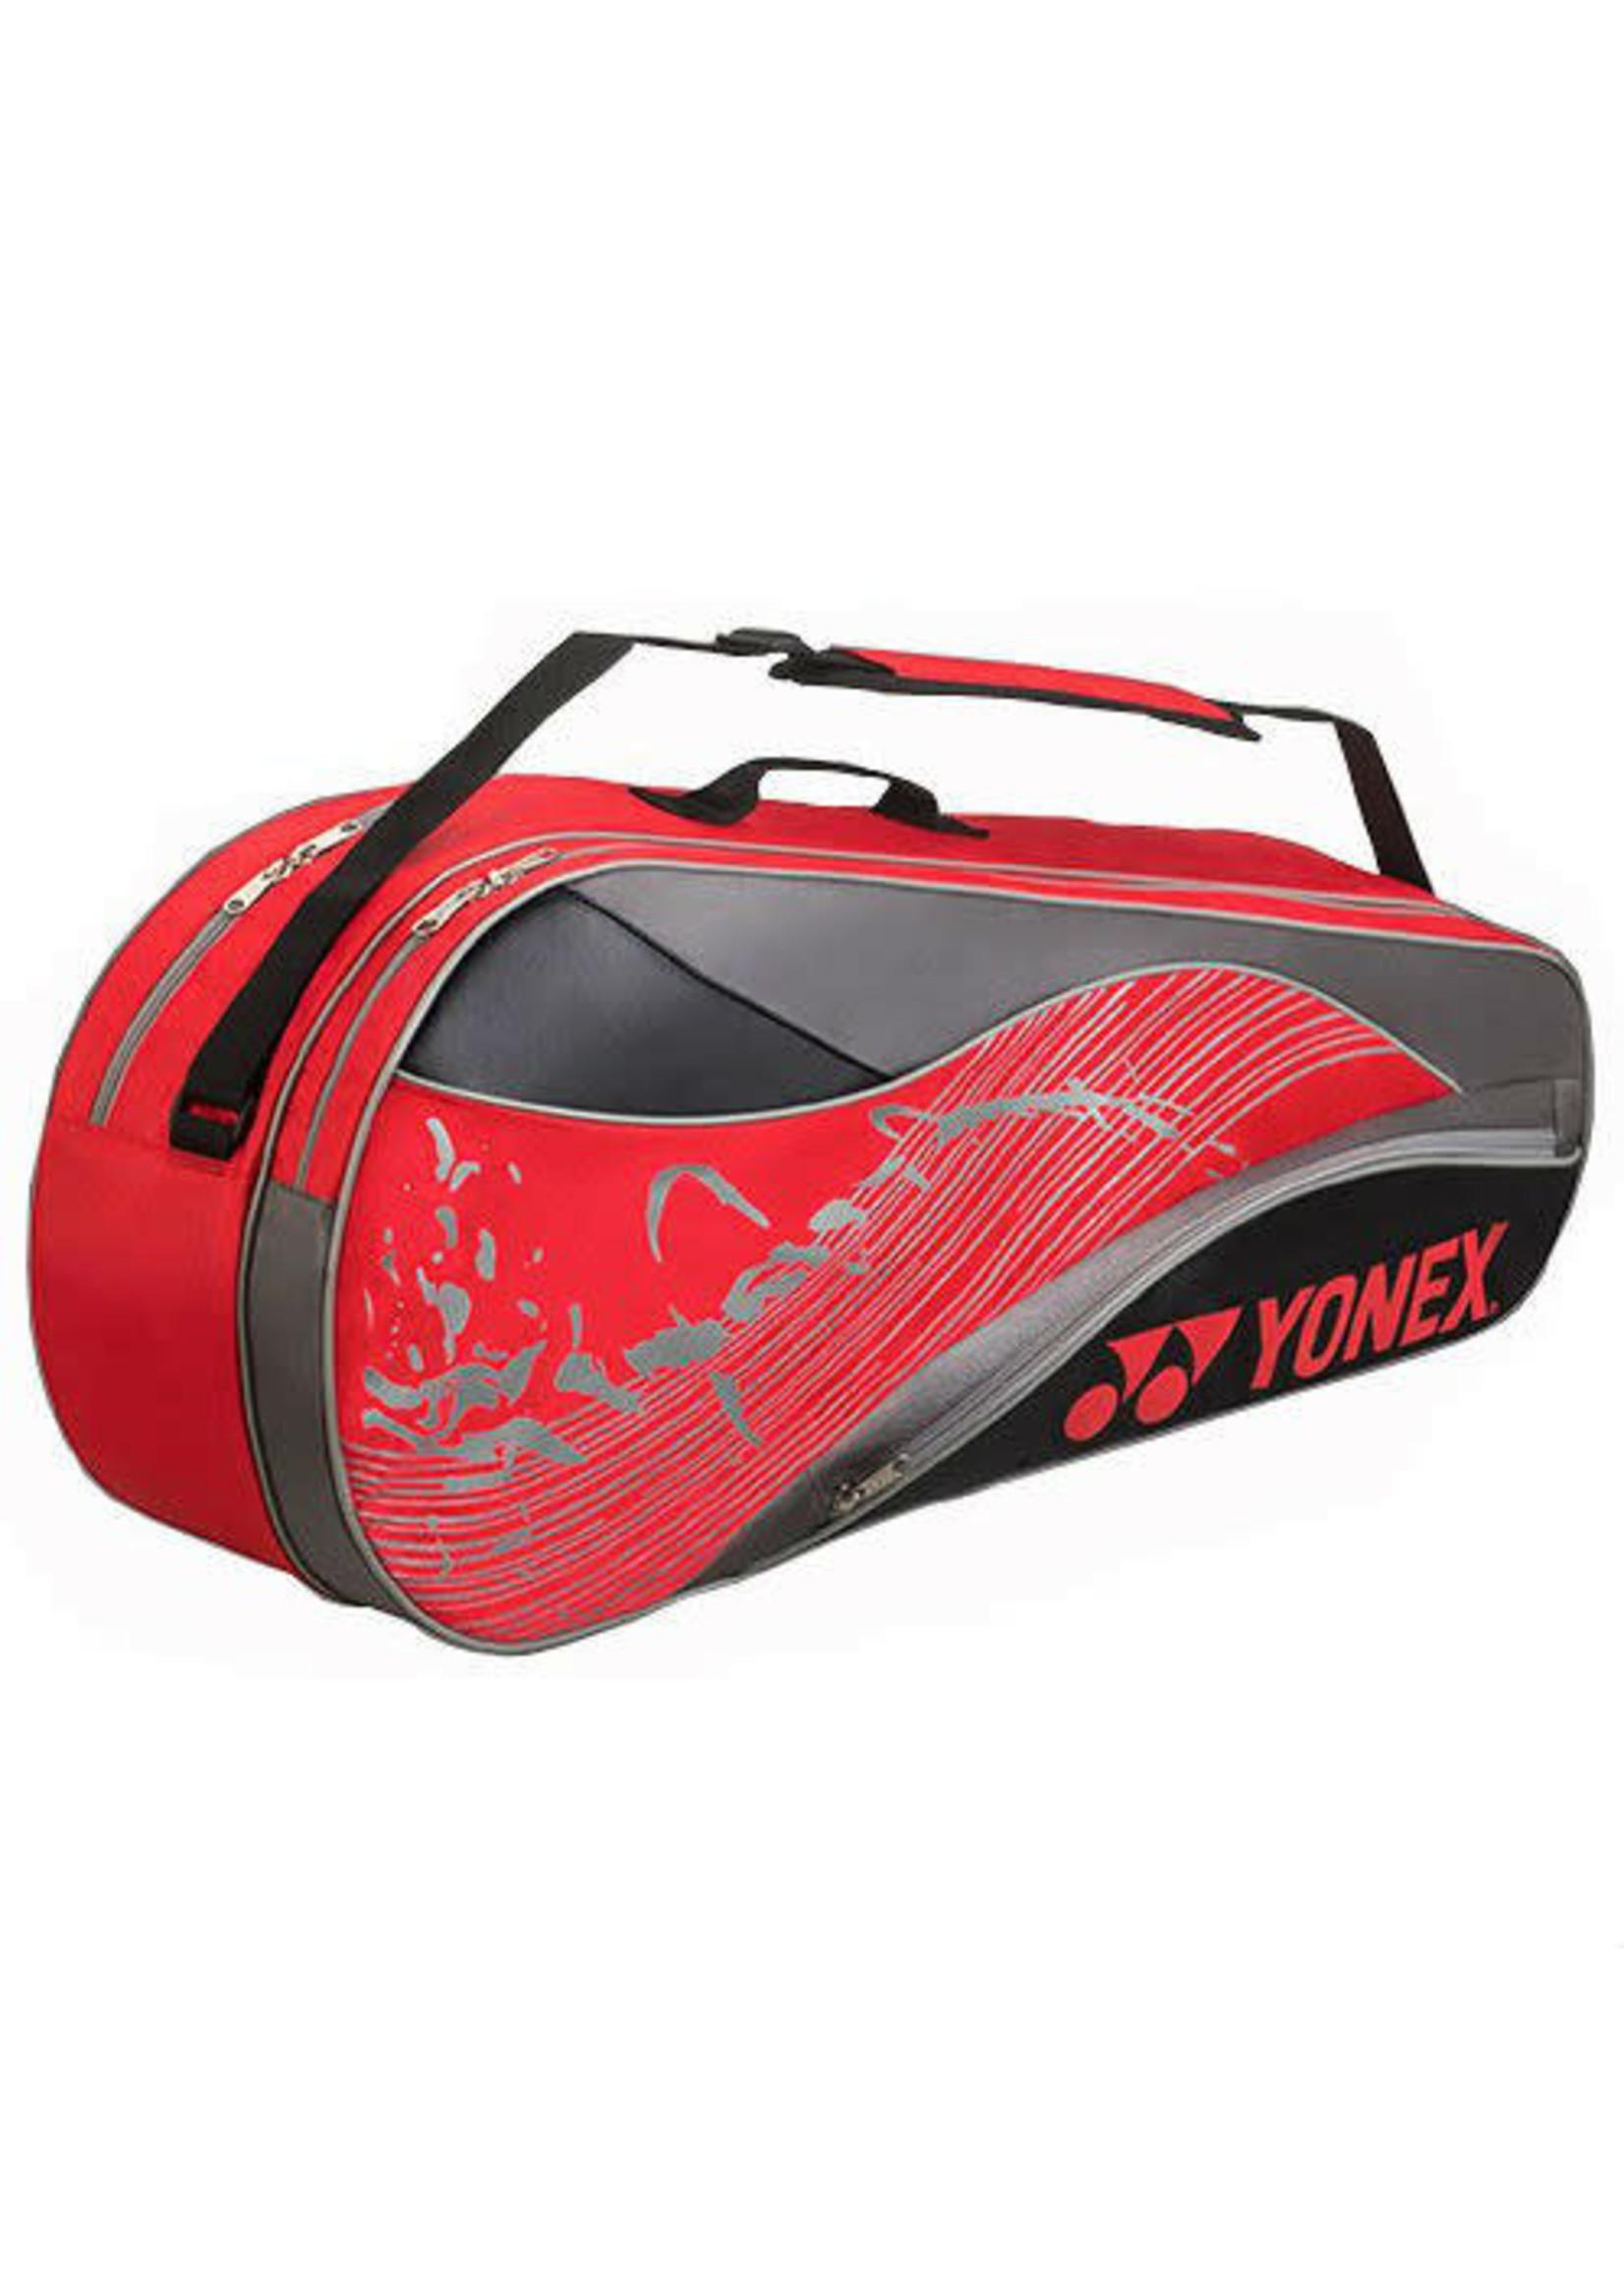 Yonex Yonex 4826EX 6 Racket Bag (2019)